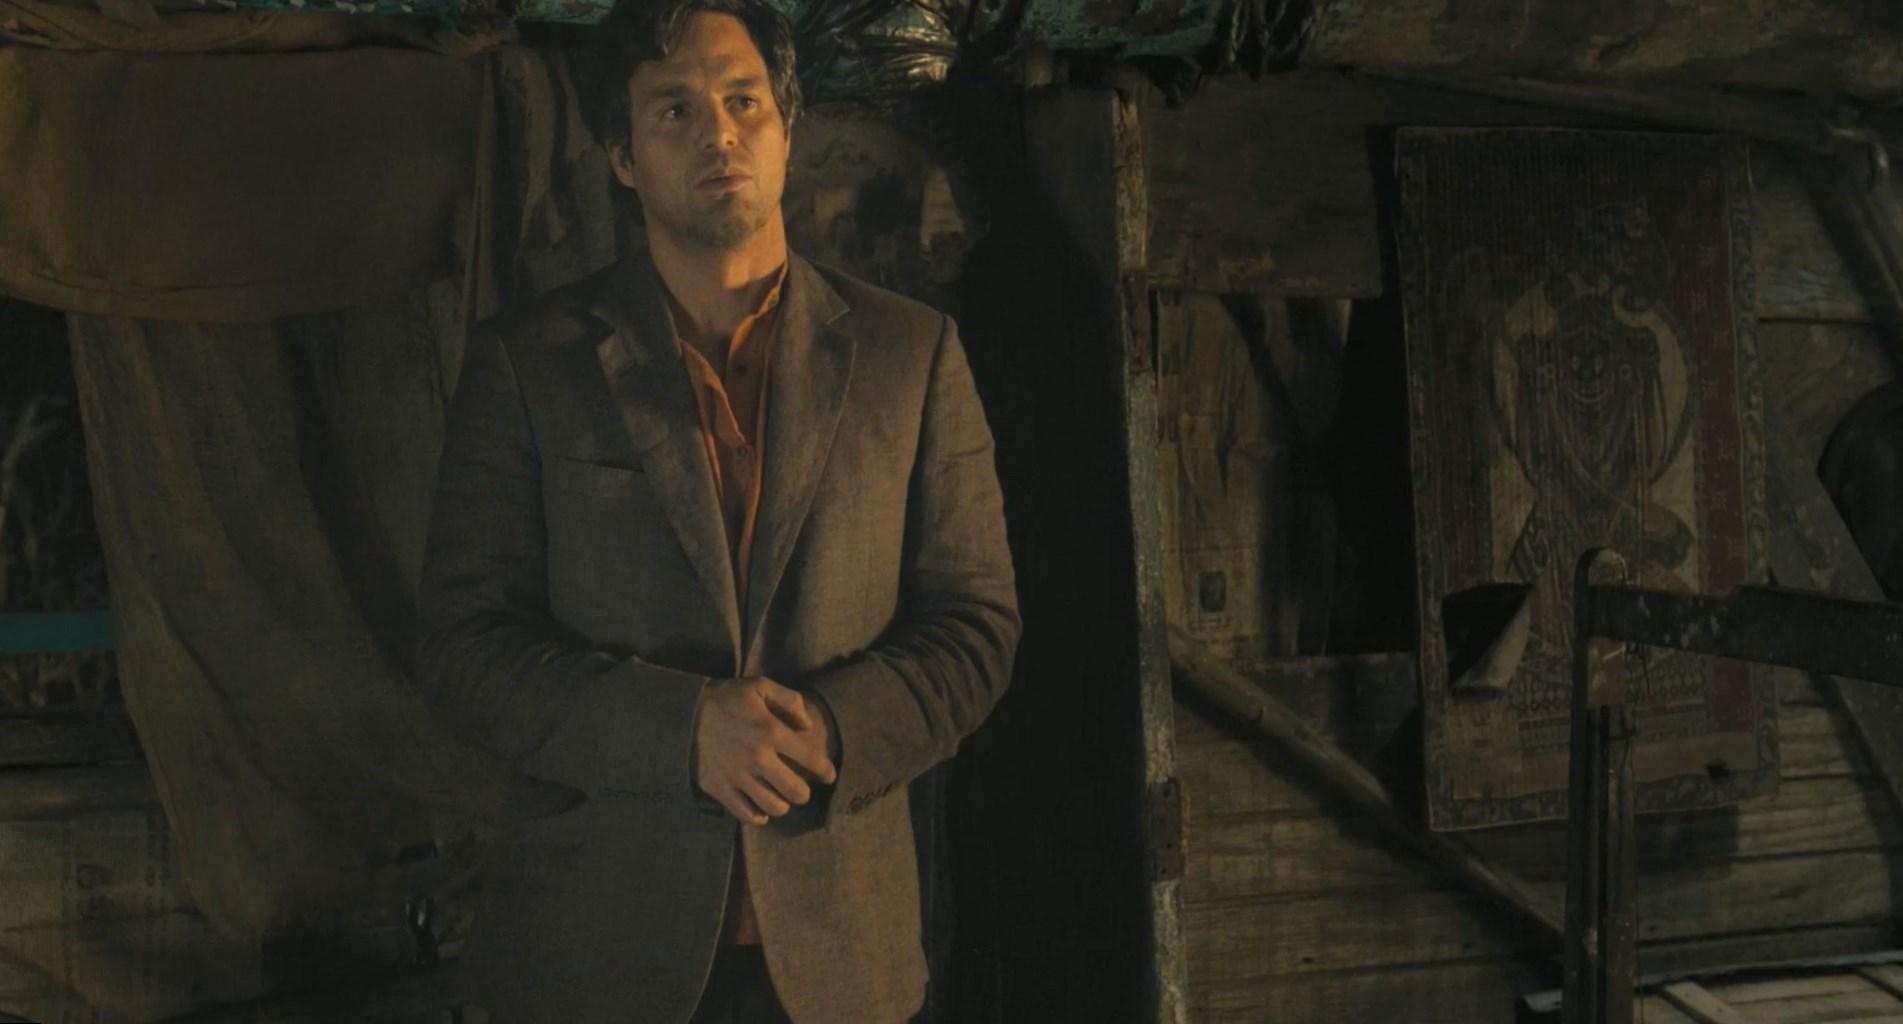 Mark Ruffalo 'The Avengers'